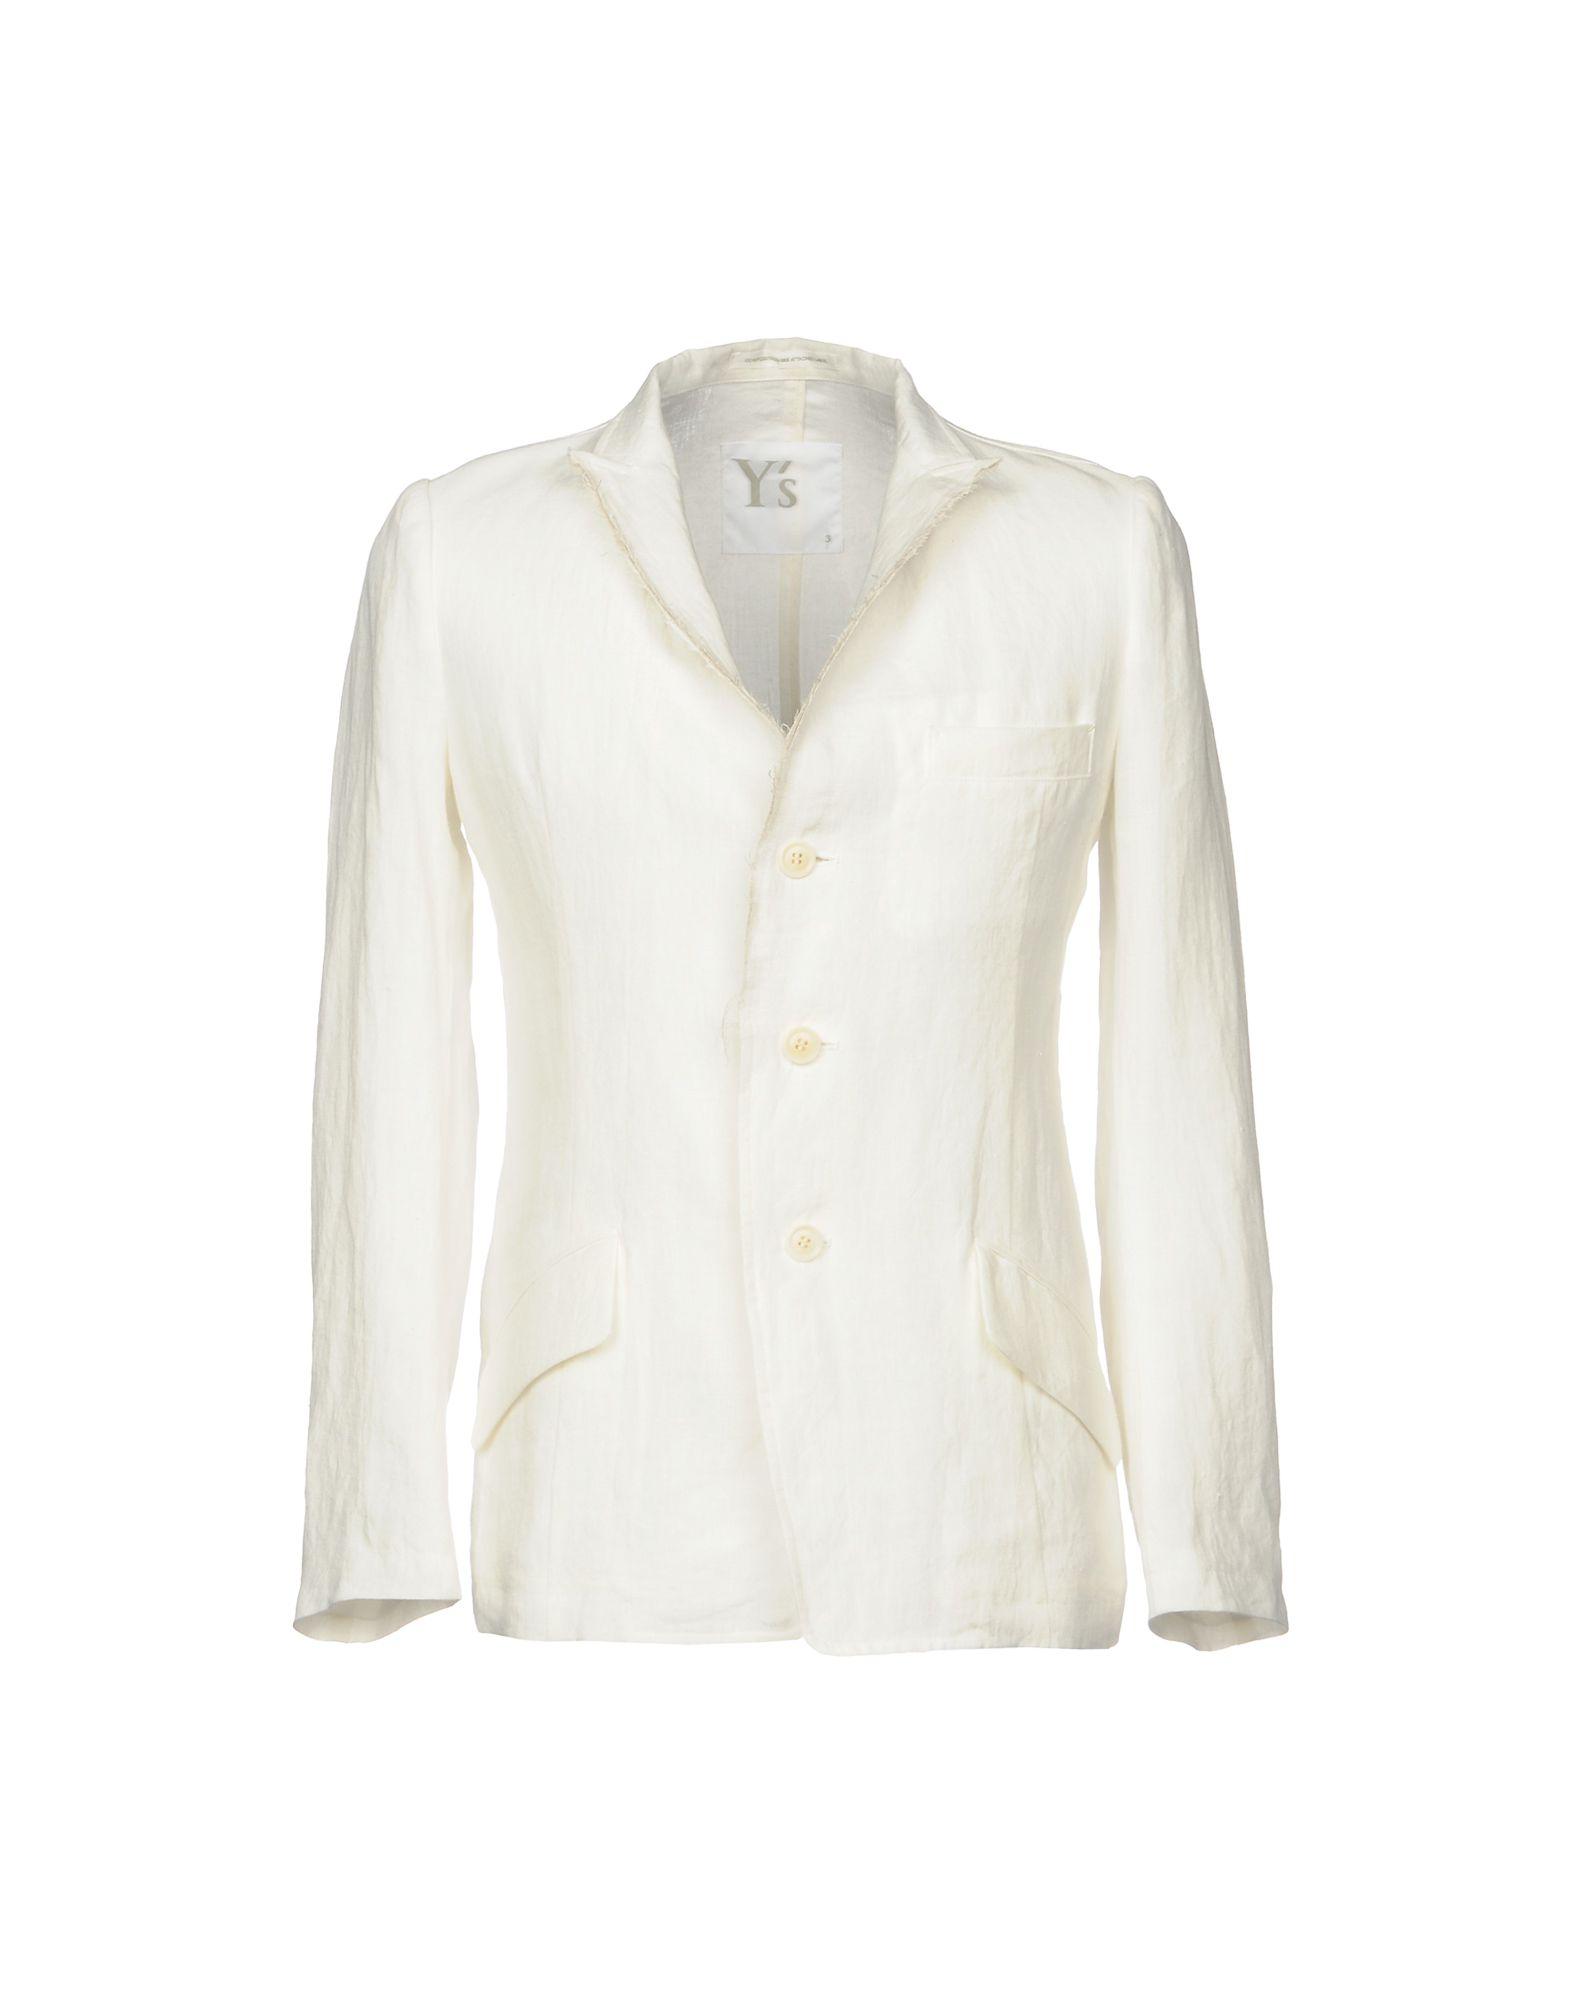 f65b718c4843 Ανδρικά ρούχα Y S YOHJI YAMAMOTO με έκπτωση έως 70%  Y S YOHJI YAMAMOTO  Κοστούμια και Σακάκια Μπλέιζερ